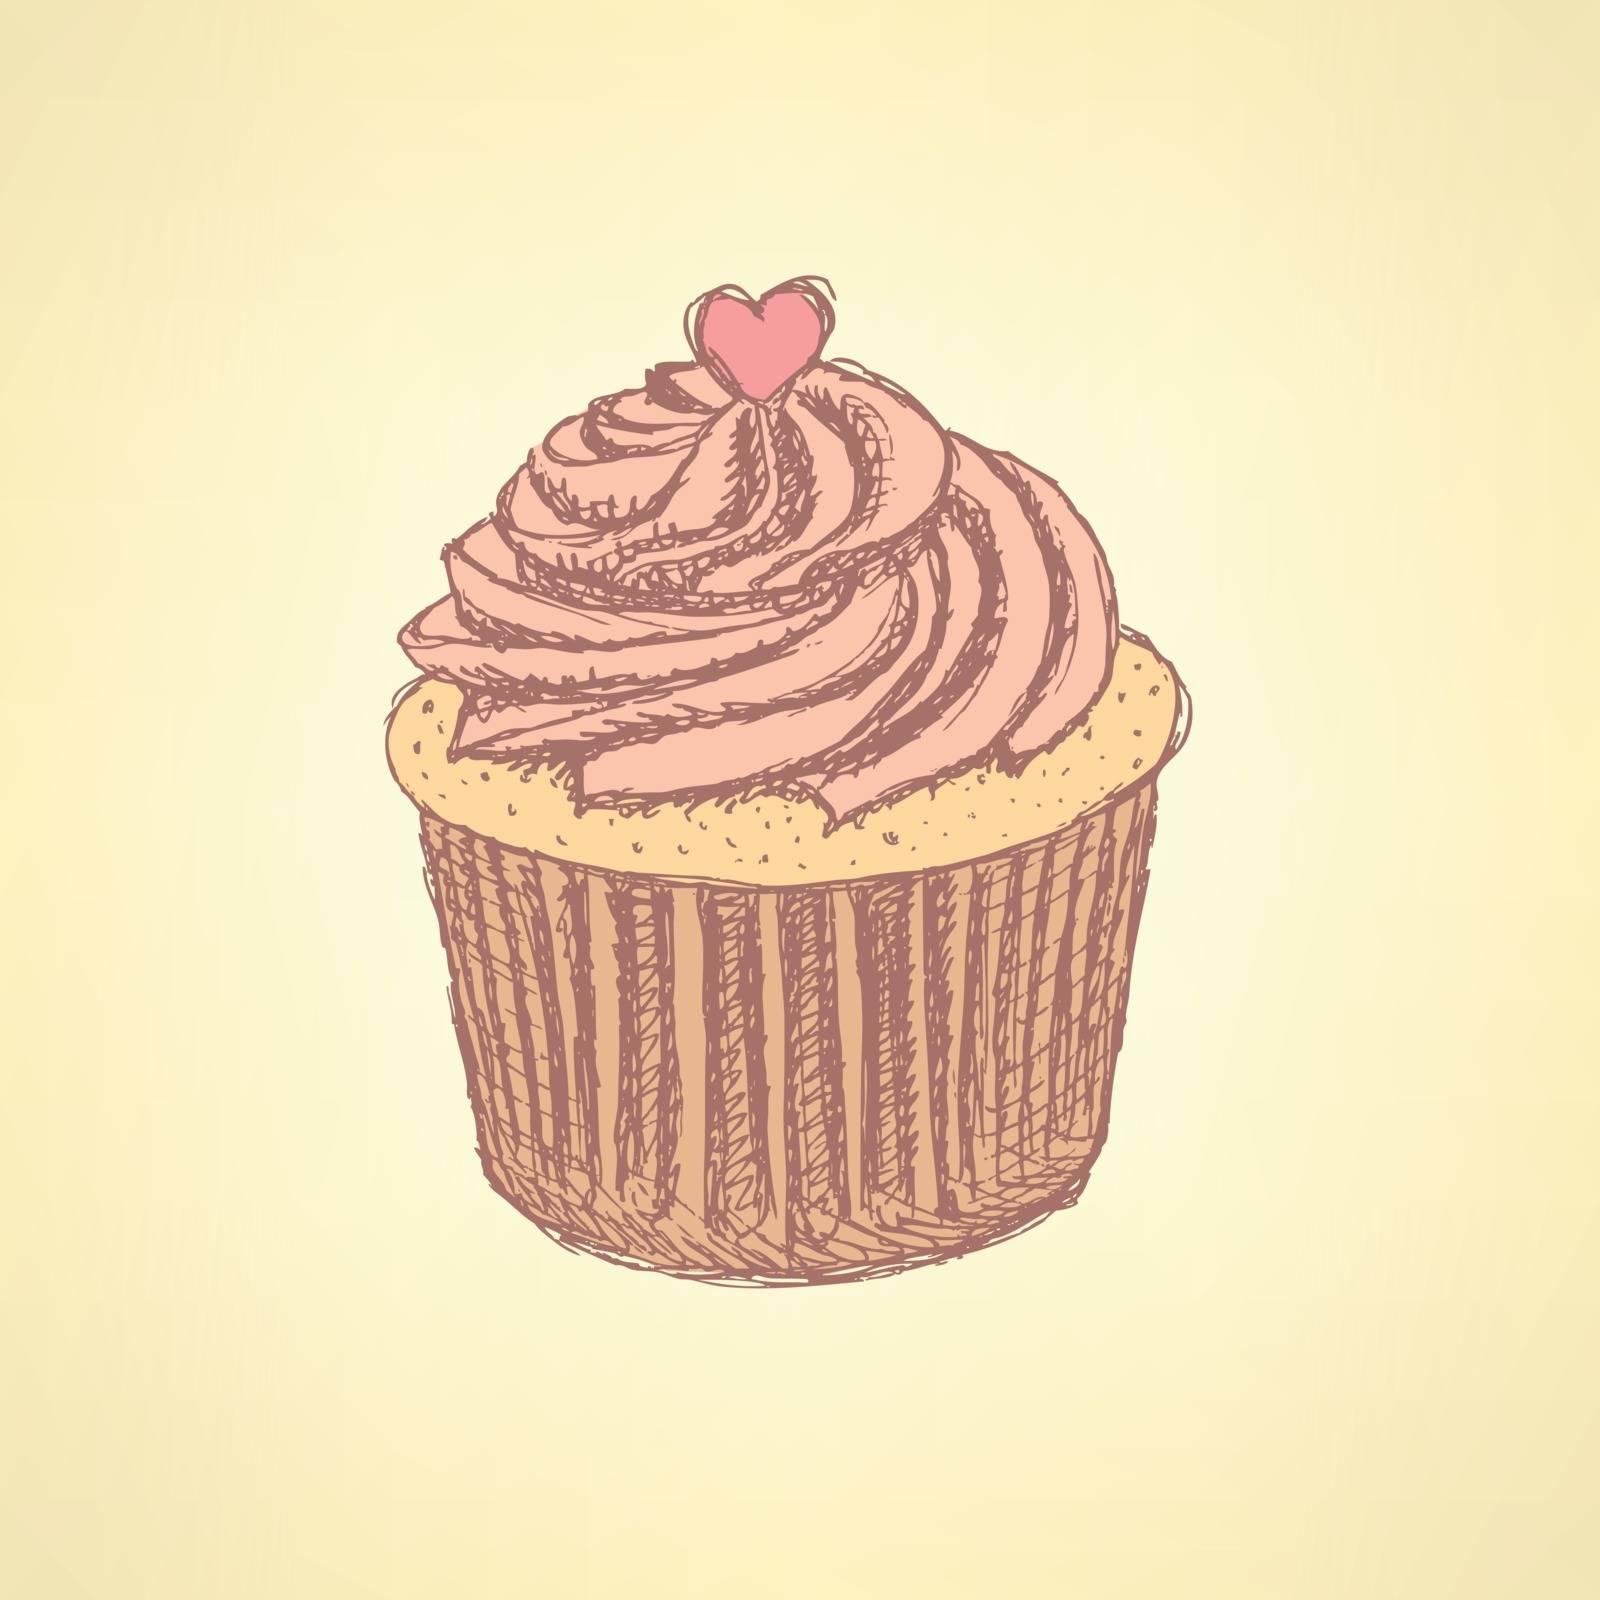 Sketch tasty cupcke in vintage style, vector background